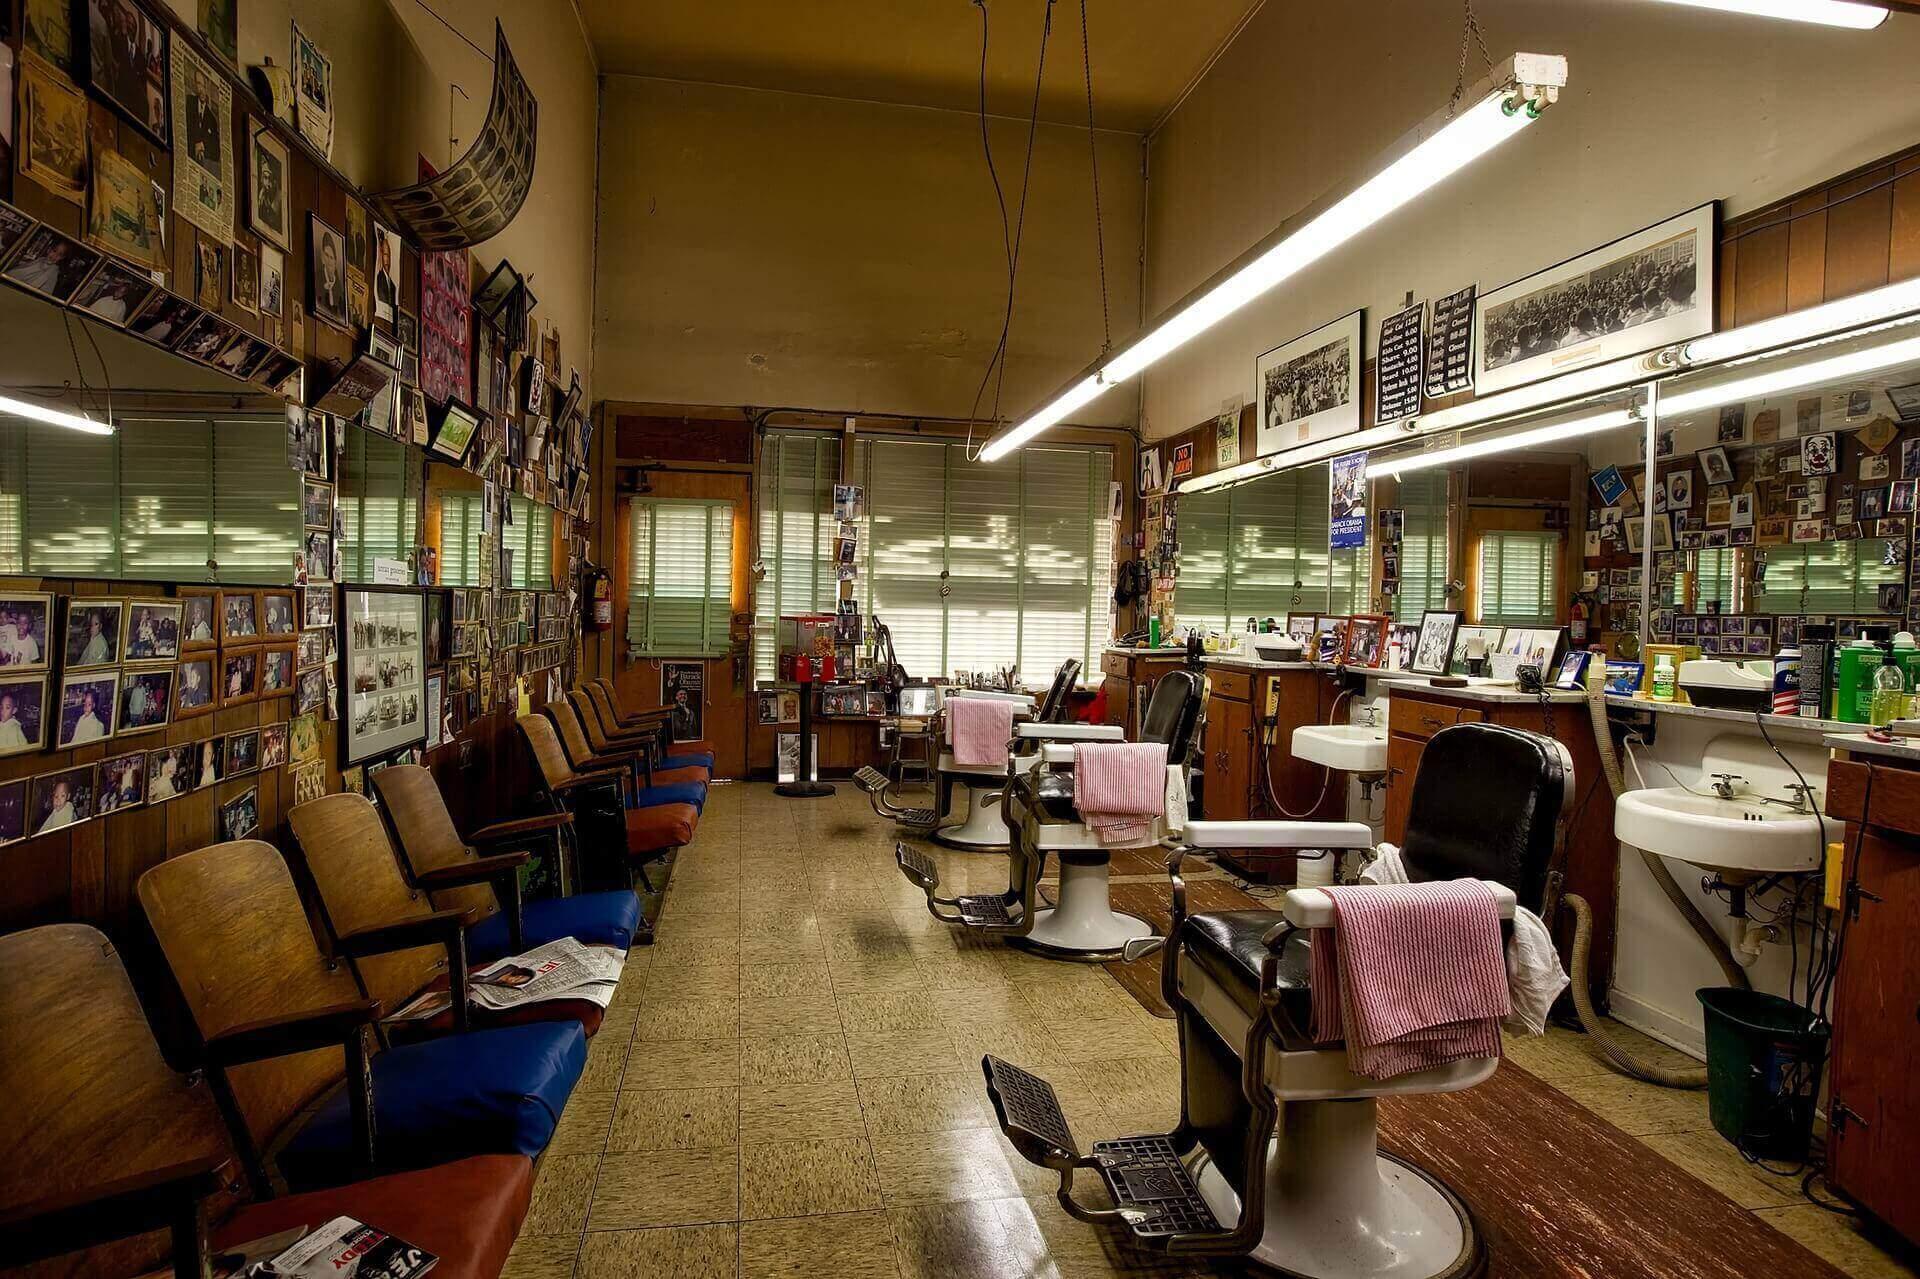 Purchasing High Quality Salon Equipment